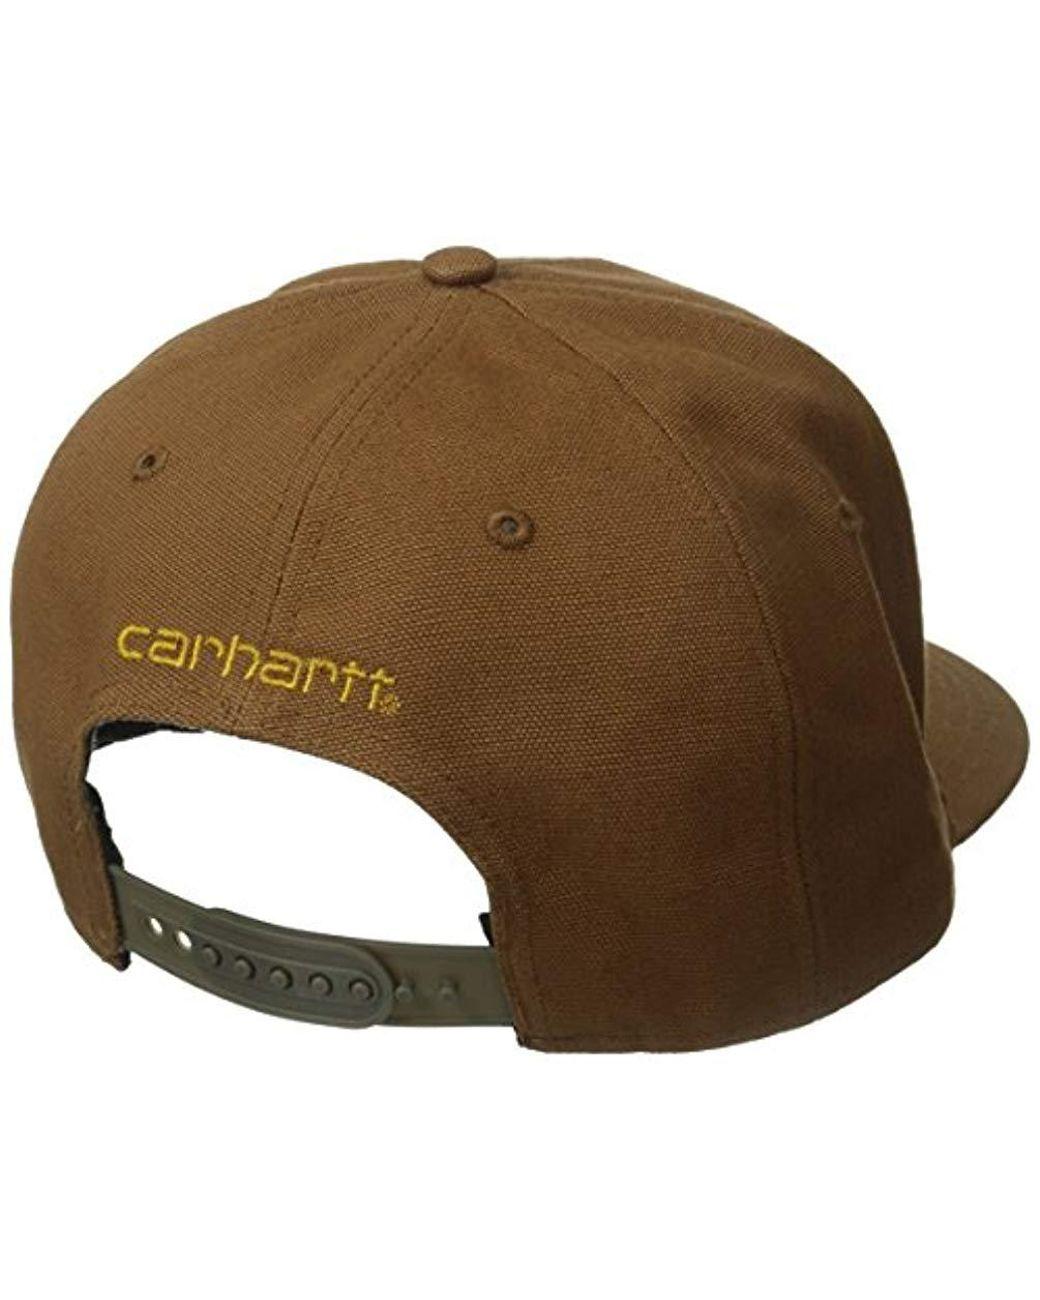 fe51865a6 Men's Brown Moisture Wicking Fast Dry Ashland Cap